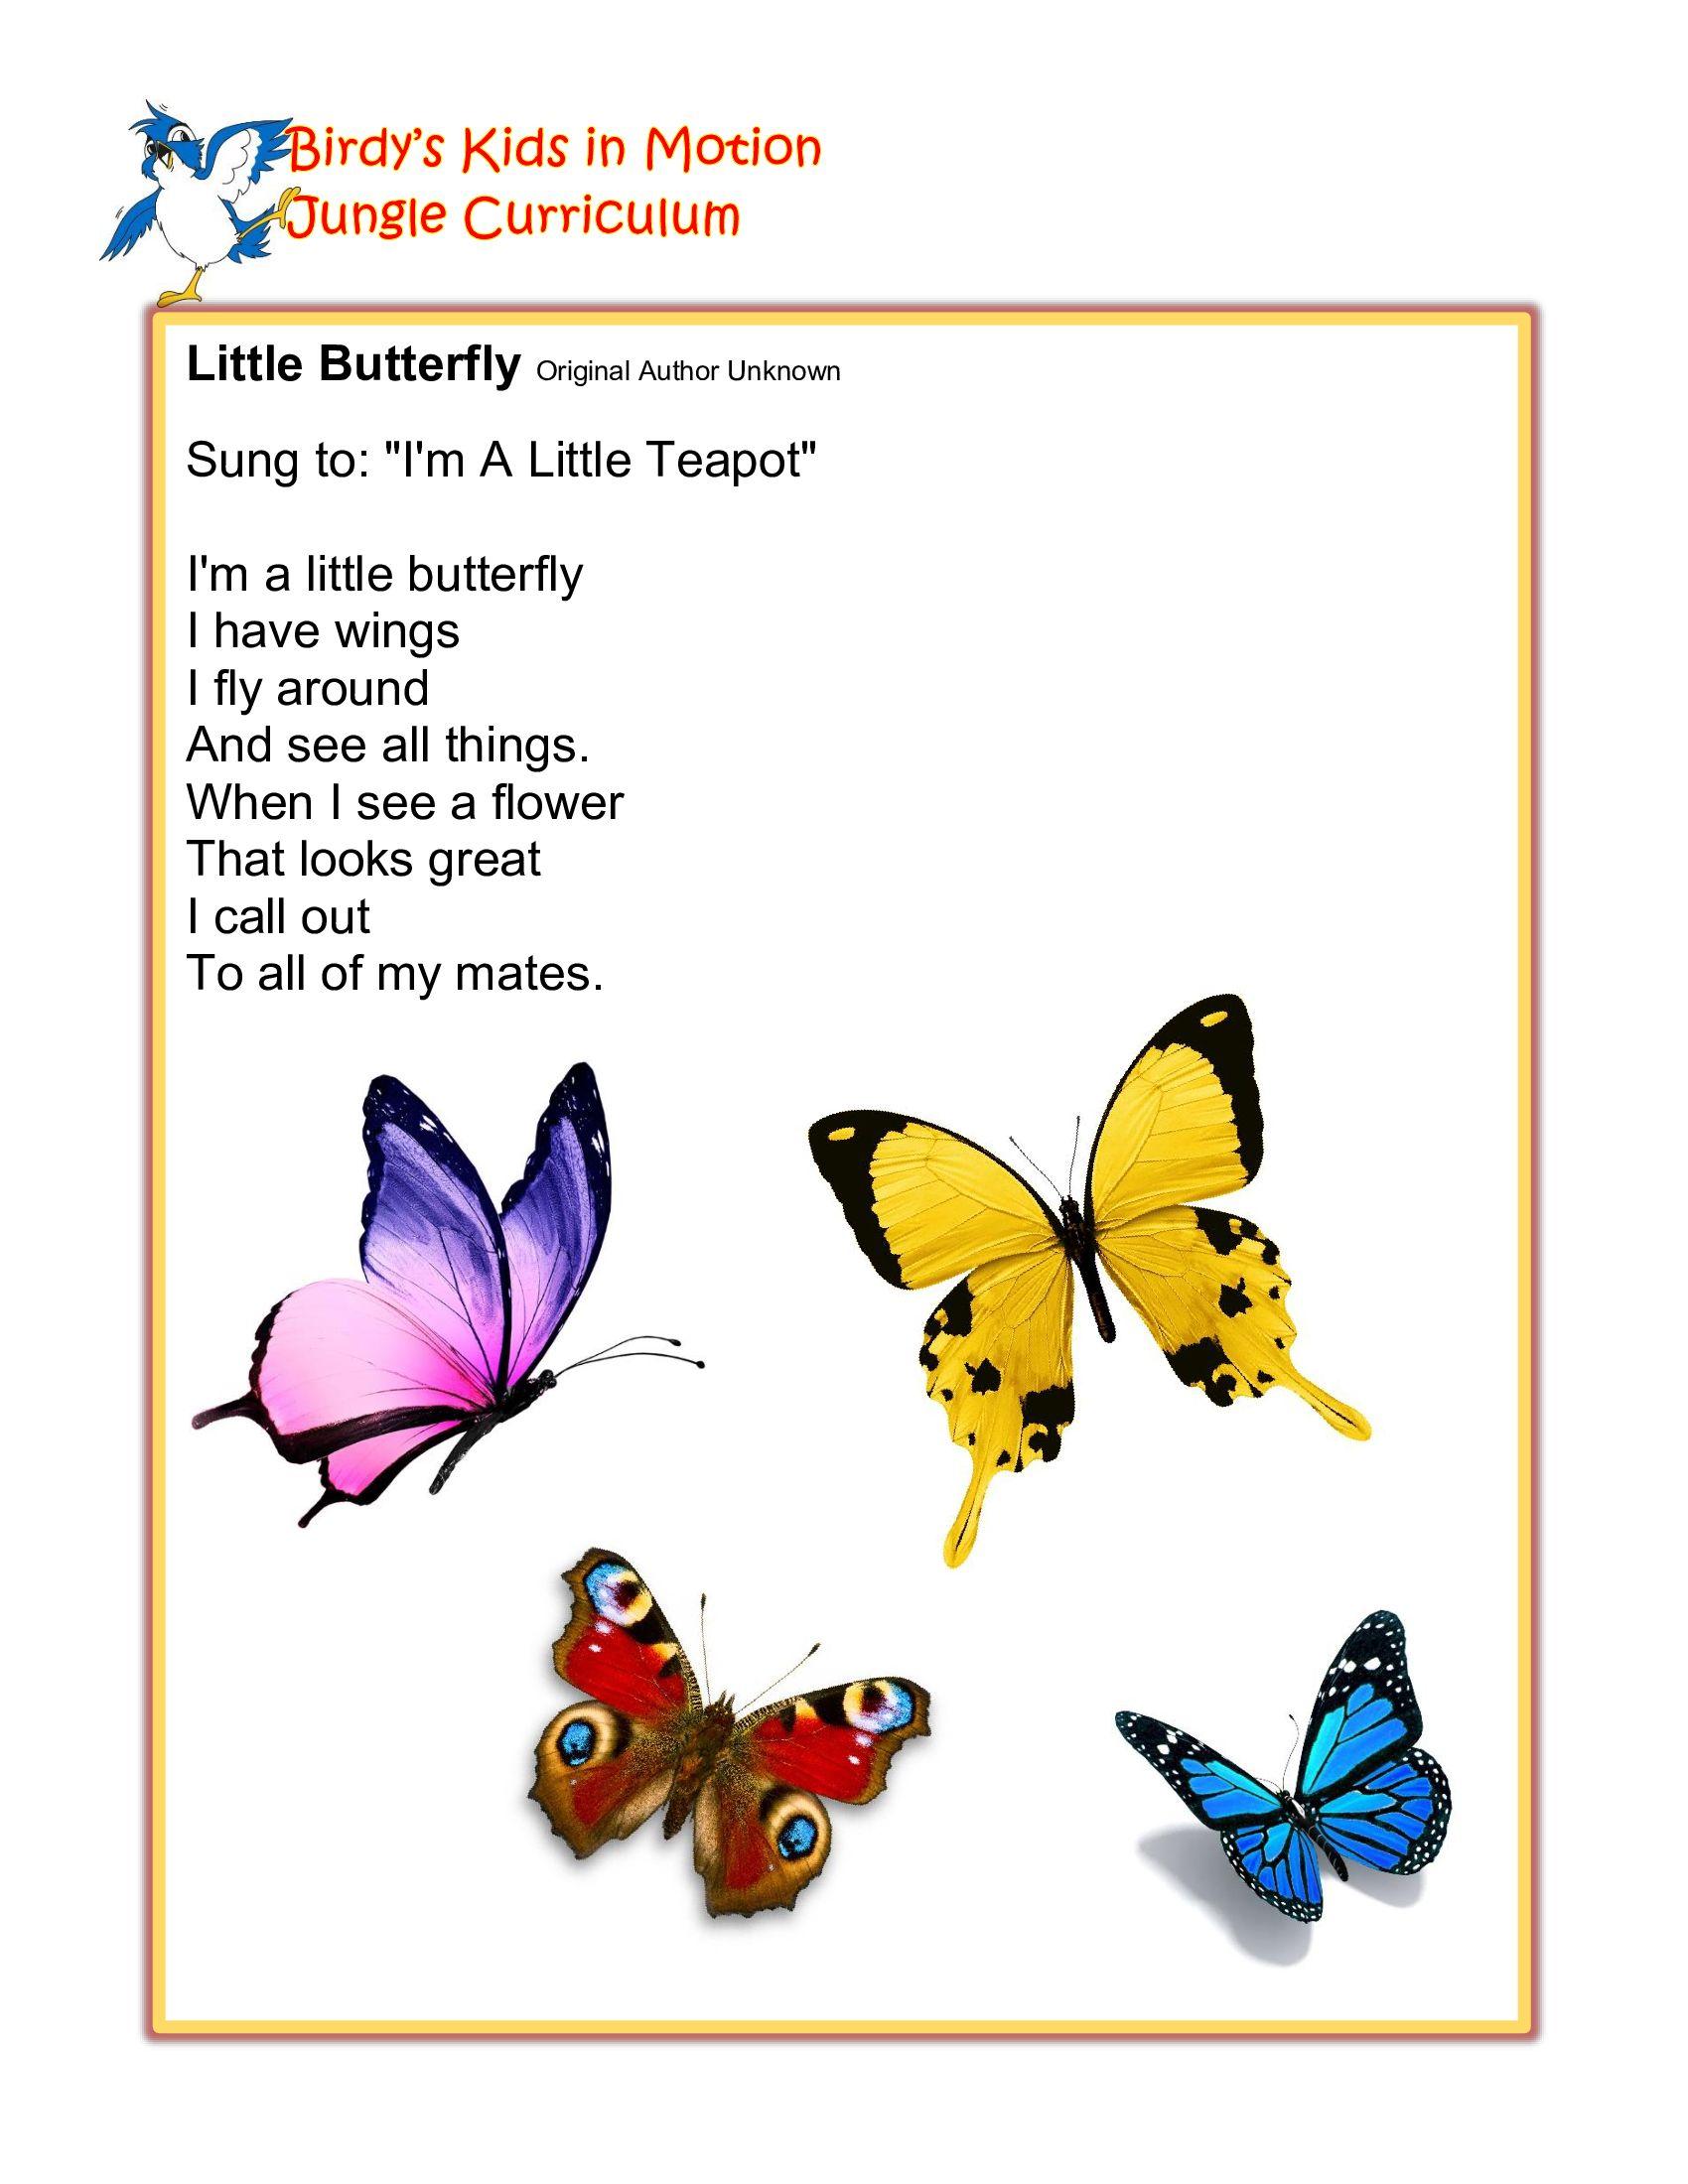 Preschool Butterfly Songs : preschool, butterfly, songs, Little, Butterfly, #BirdysKids, #ToddlerCreativeMovement, Songs,, Jungle, Theme,, Childhood, Education